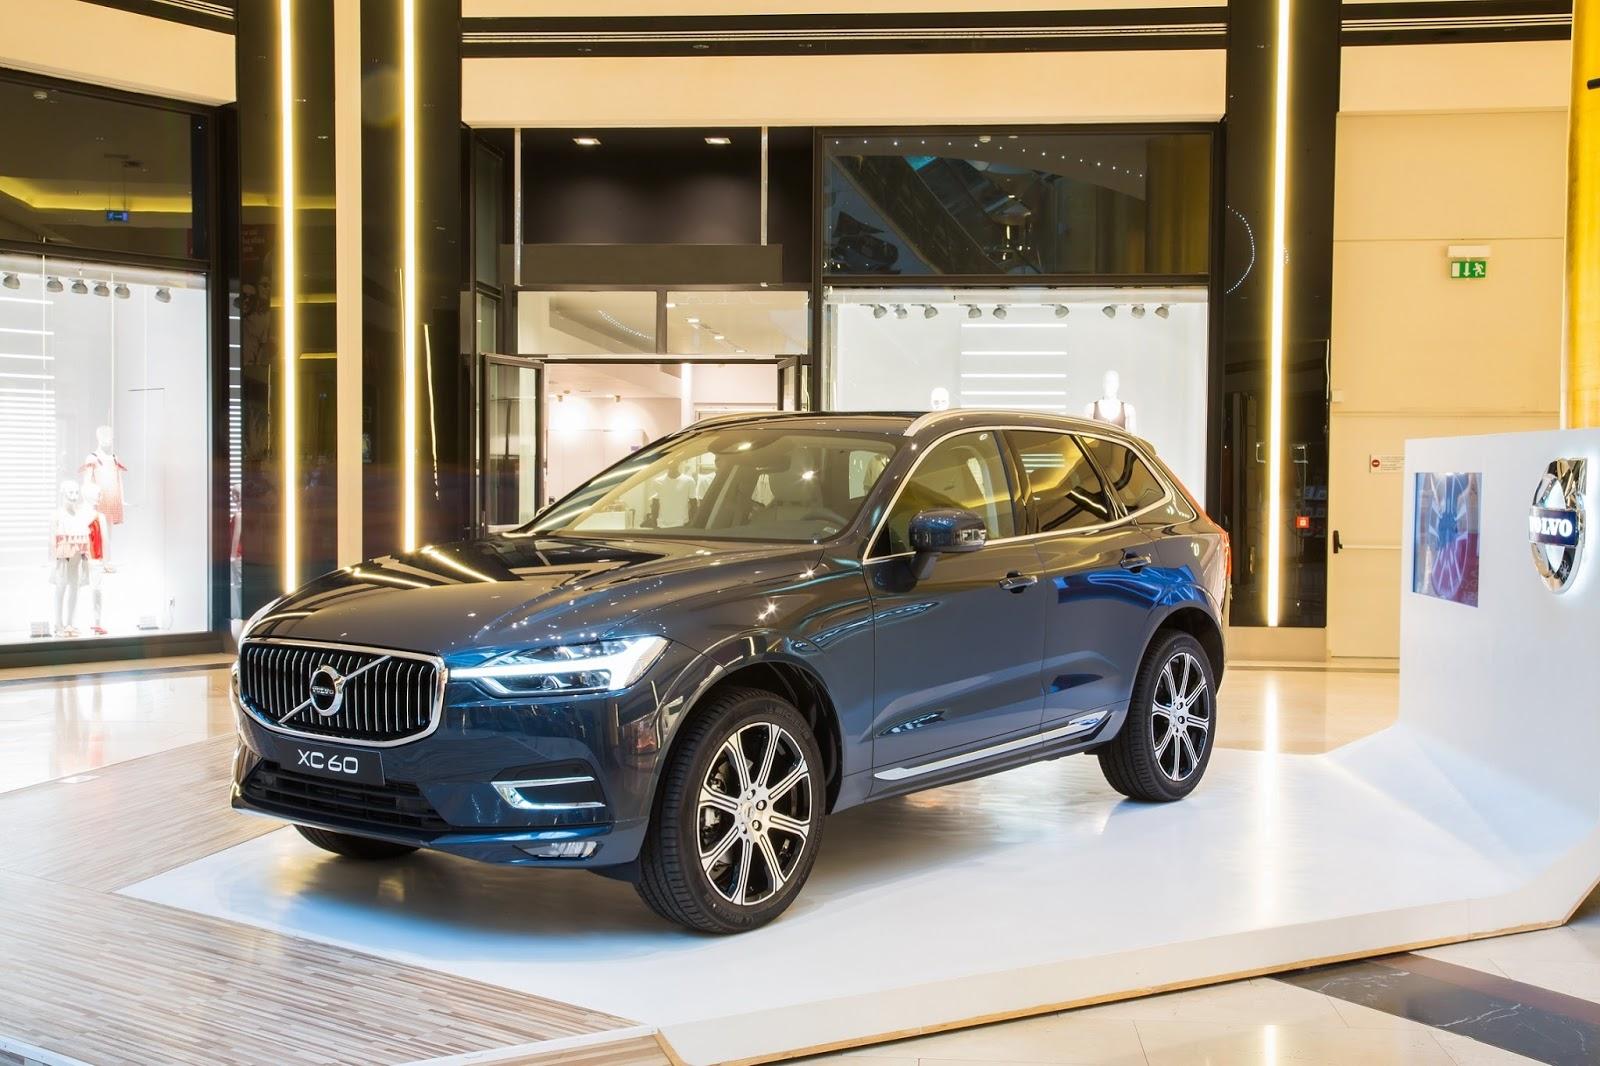 NEW2BVOLVO2BXC602B2540GOLDEN2BHALL DENIM2BBLUE 2 Από 53.490 ευρώ οι τιμές του νέου XC60 Volvo, Volvo XC60, αυτοκίνητα, καινούργιο, καινούρια, τιμες